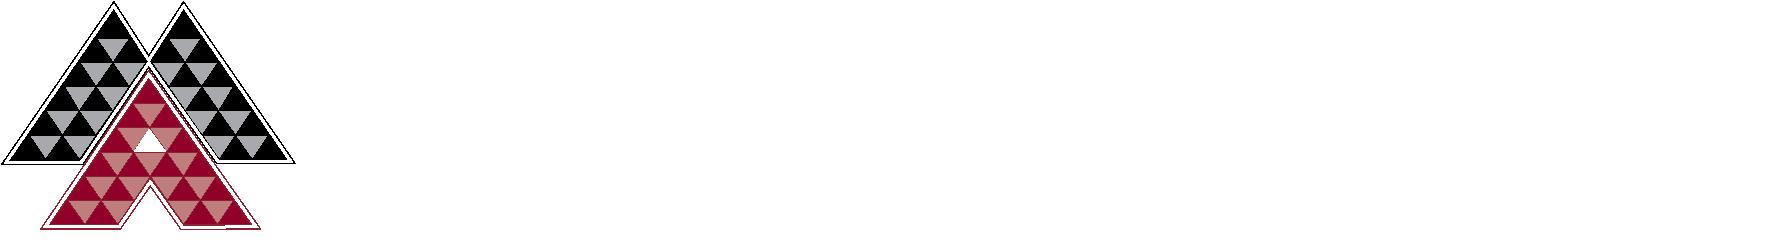 Manufacturers Alliance logo Reversed